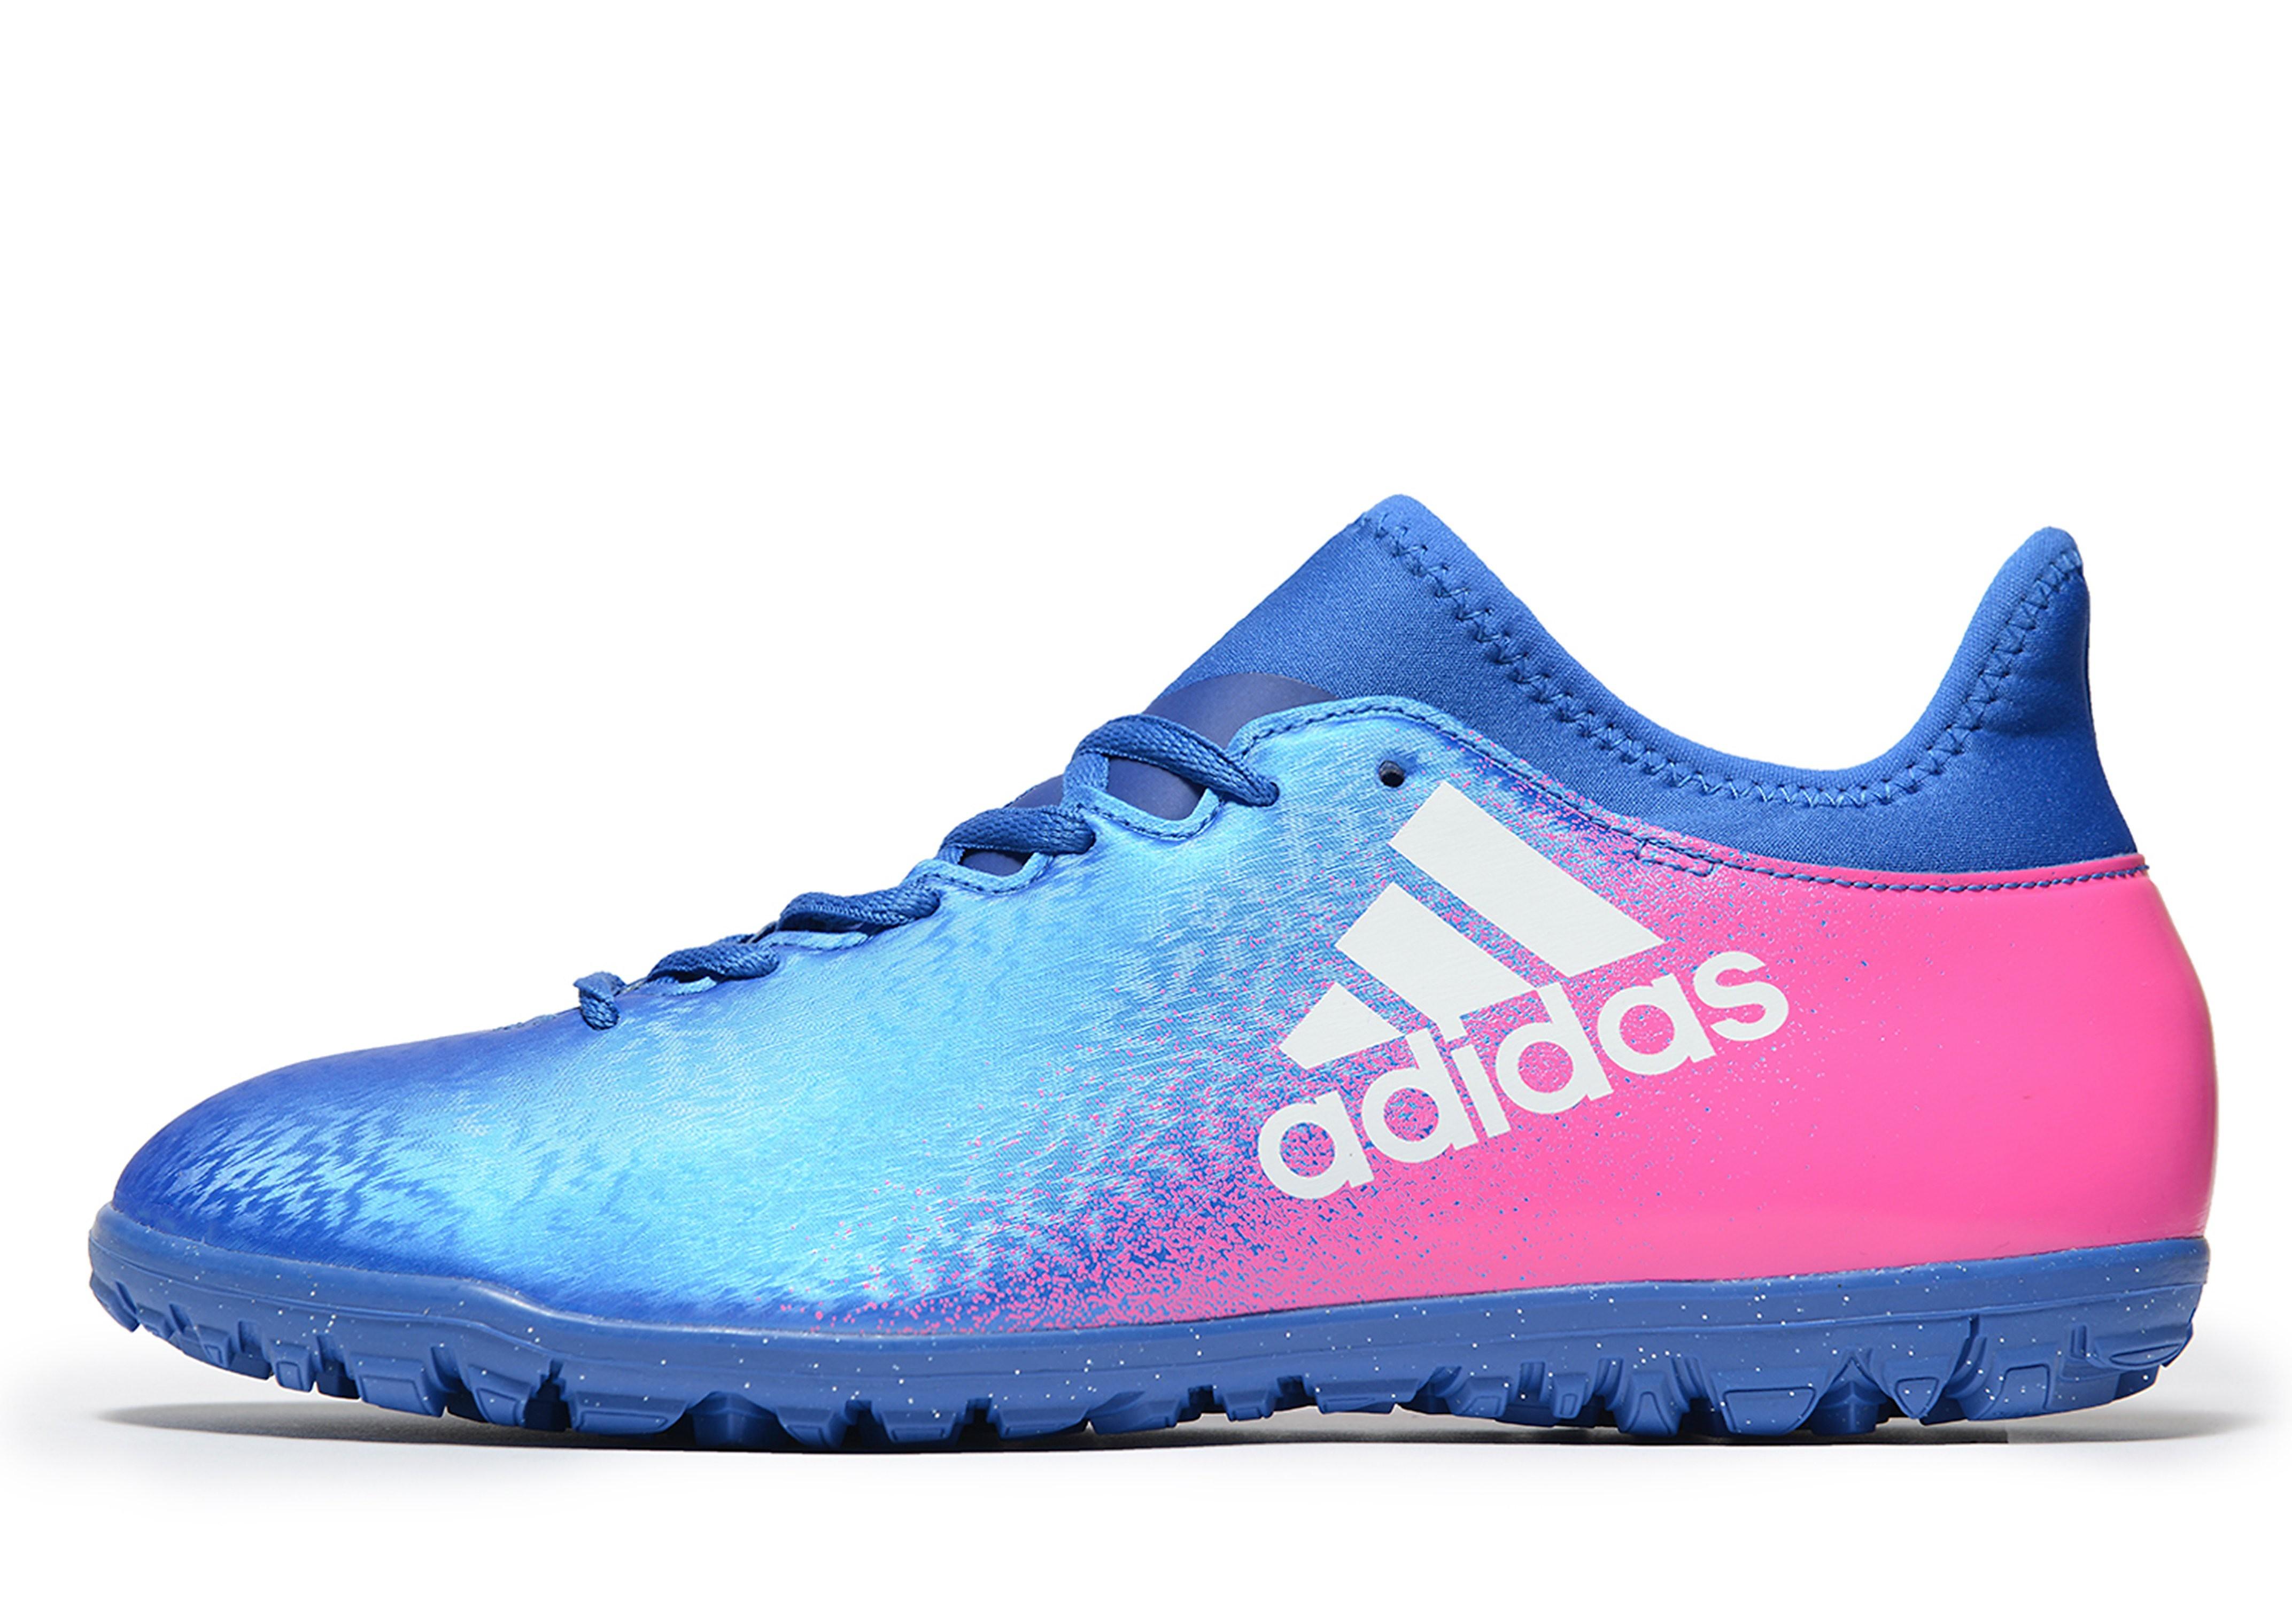 adidas Blue Blast X 16.3 TF